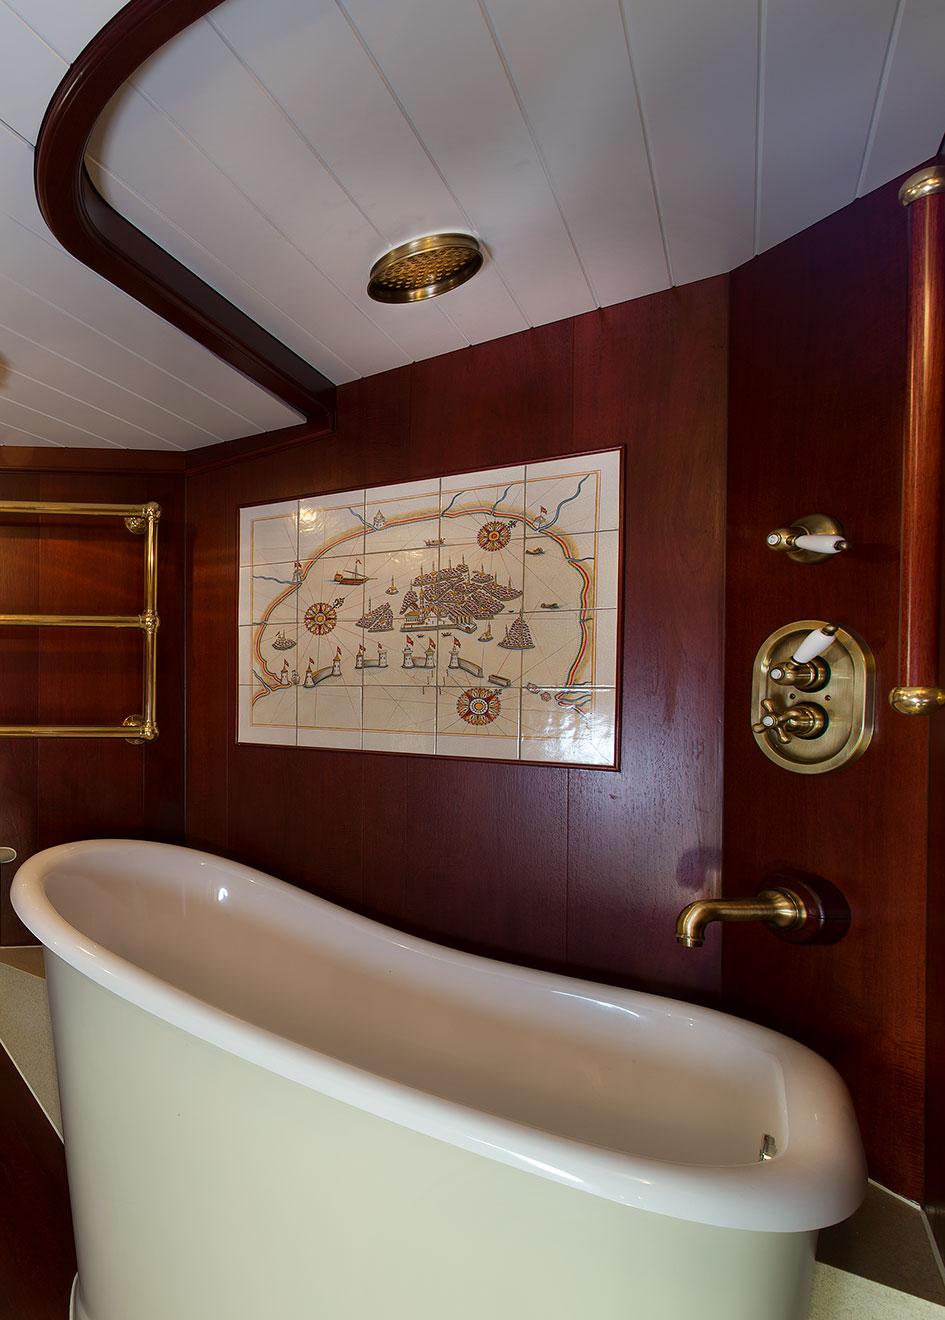 the-master-en-suite-of-the-gaff-rigged-sailing-superyacht-spirit-of-venice-credit-olivier-van-meer-vmg-yachtbuilders